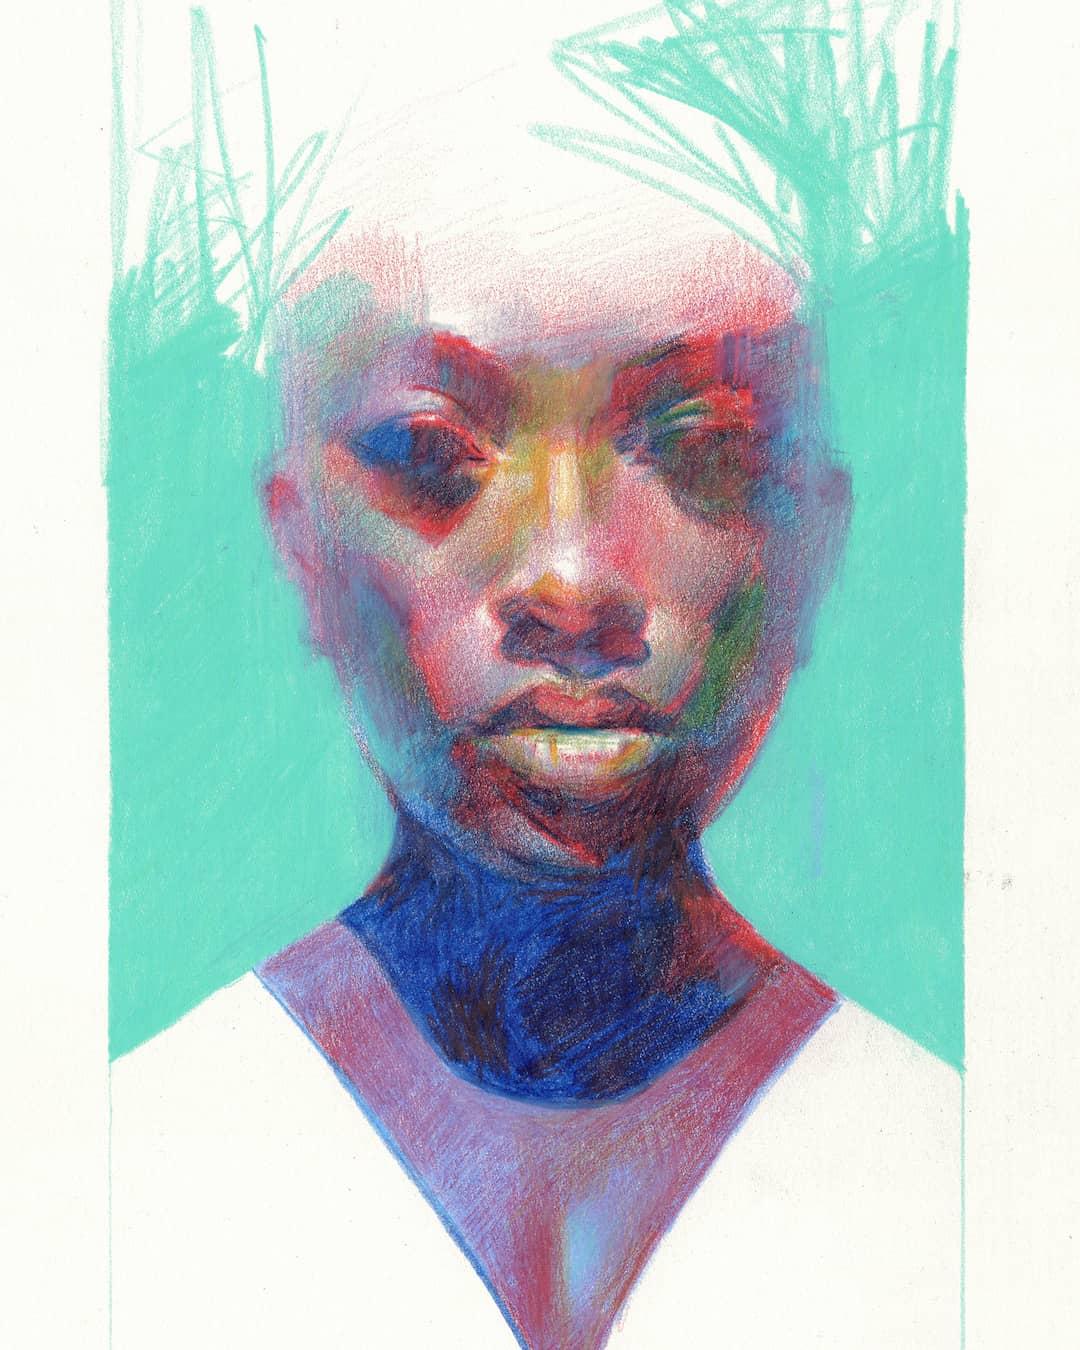 Image of Crease prints